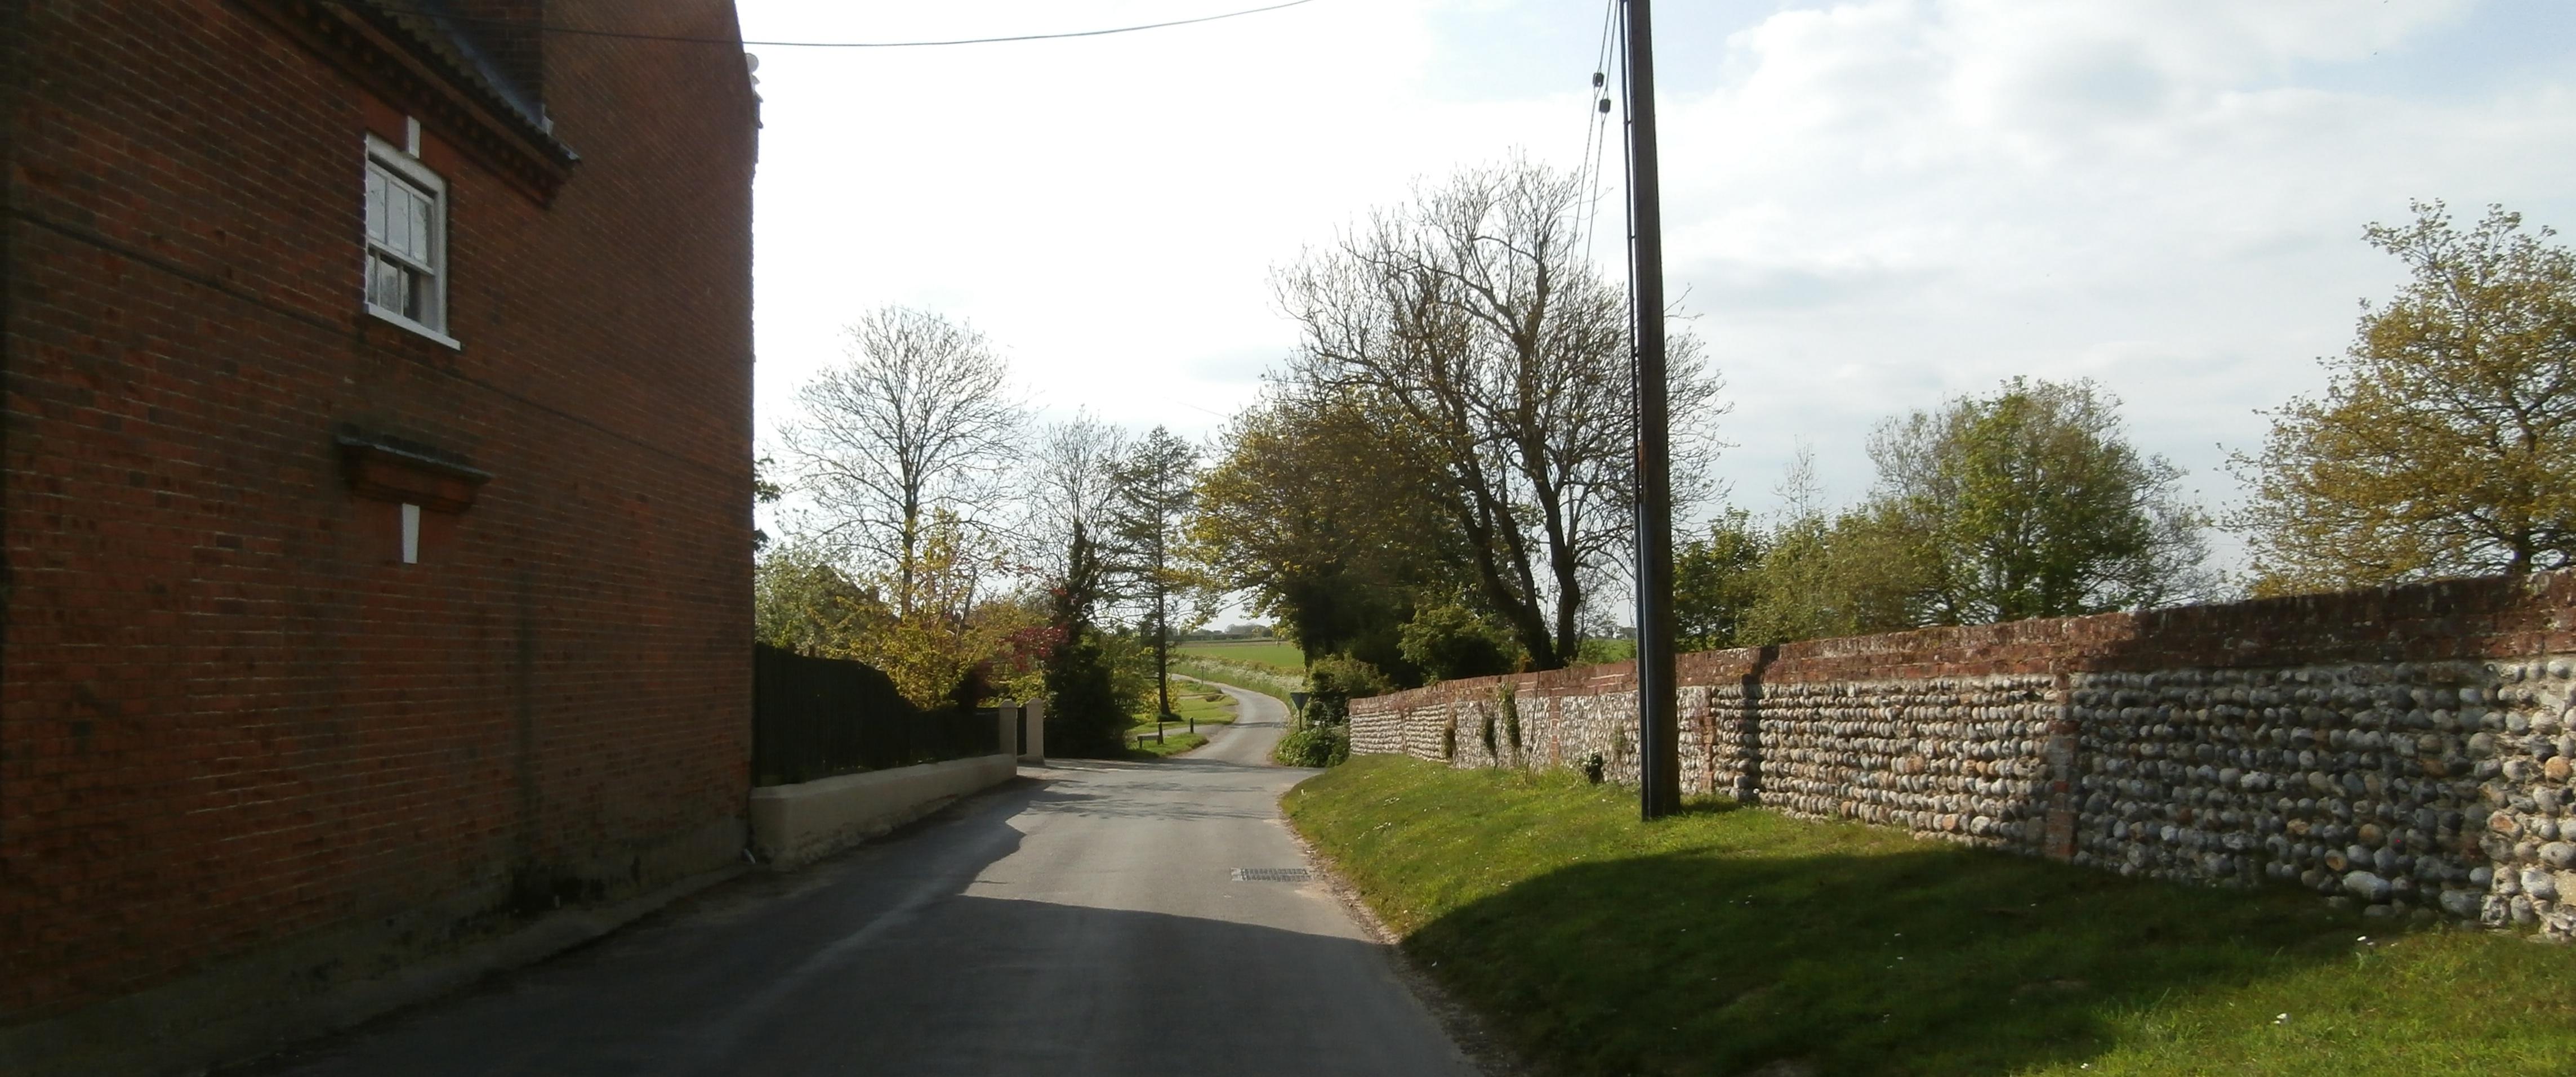 Southrepps Lane